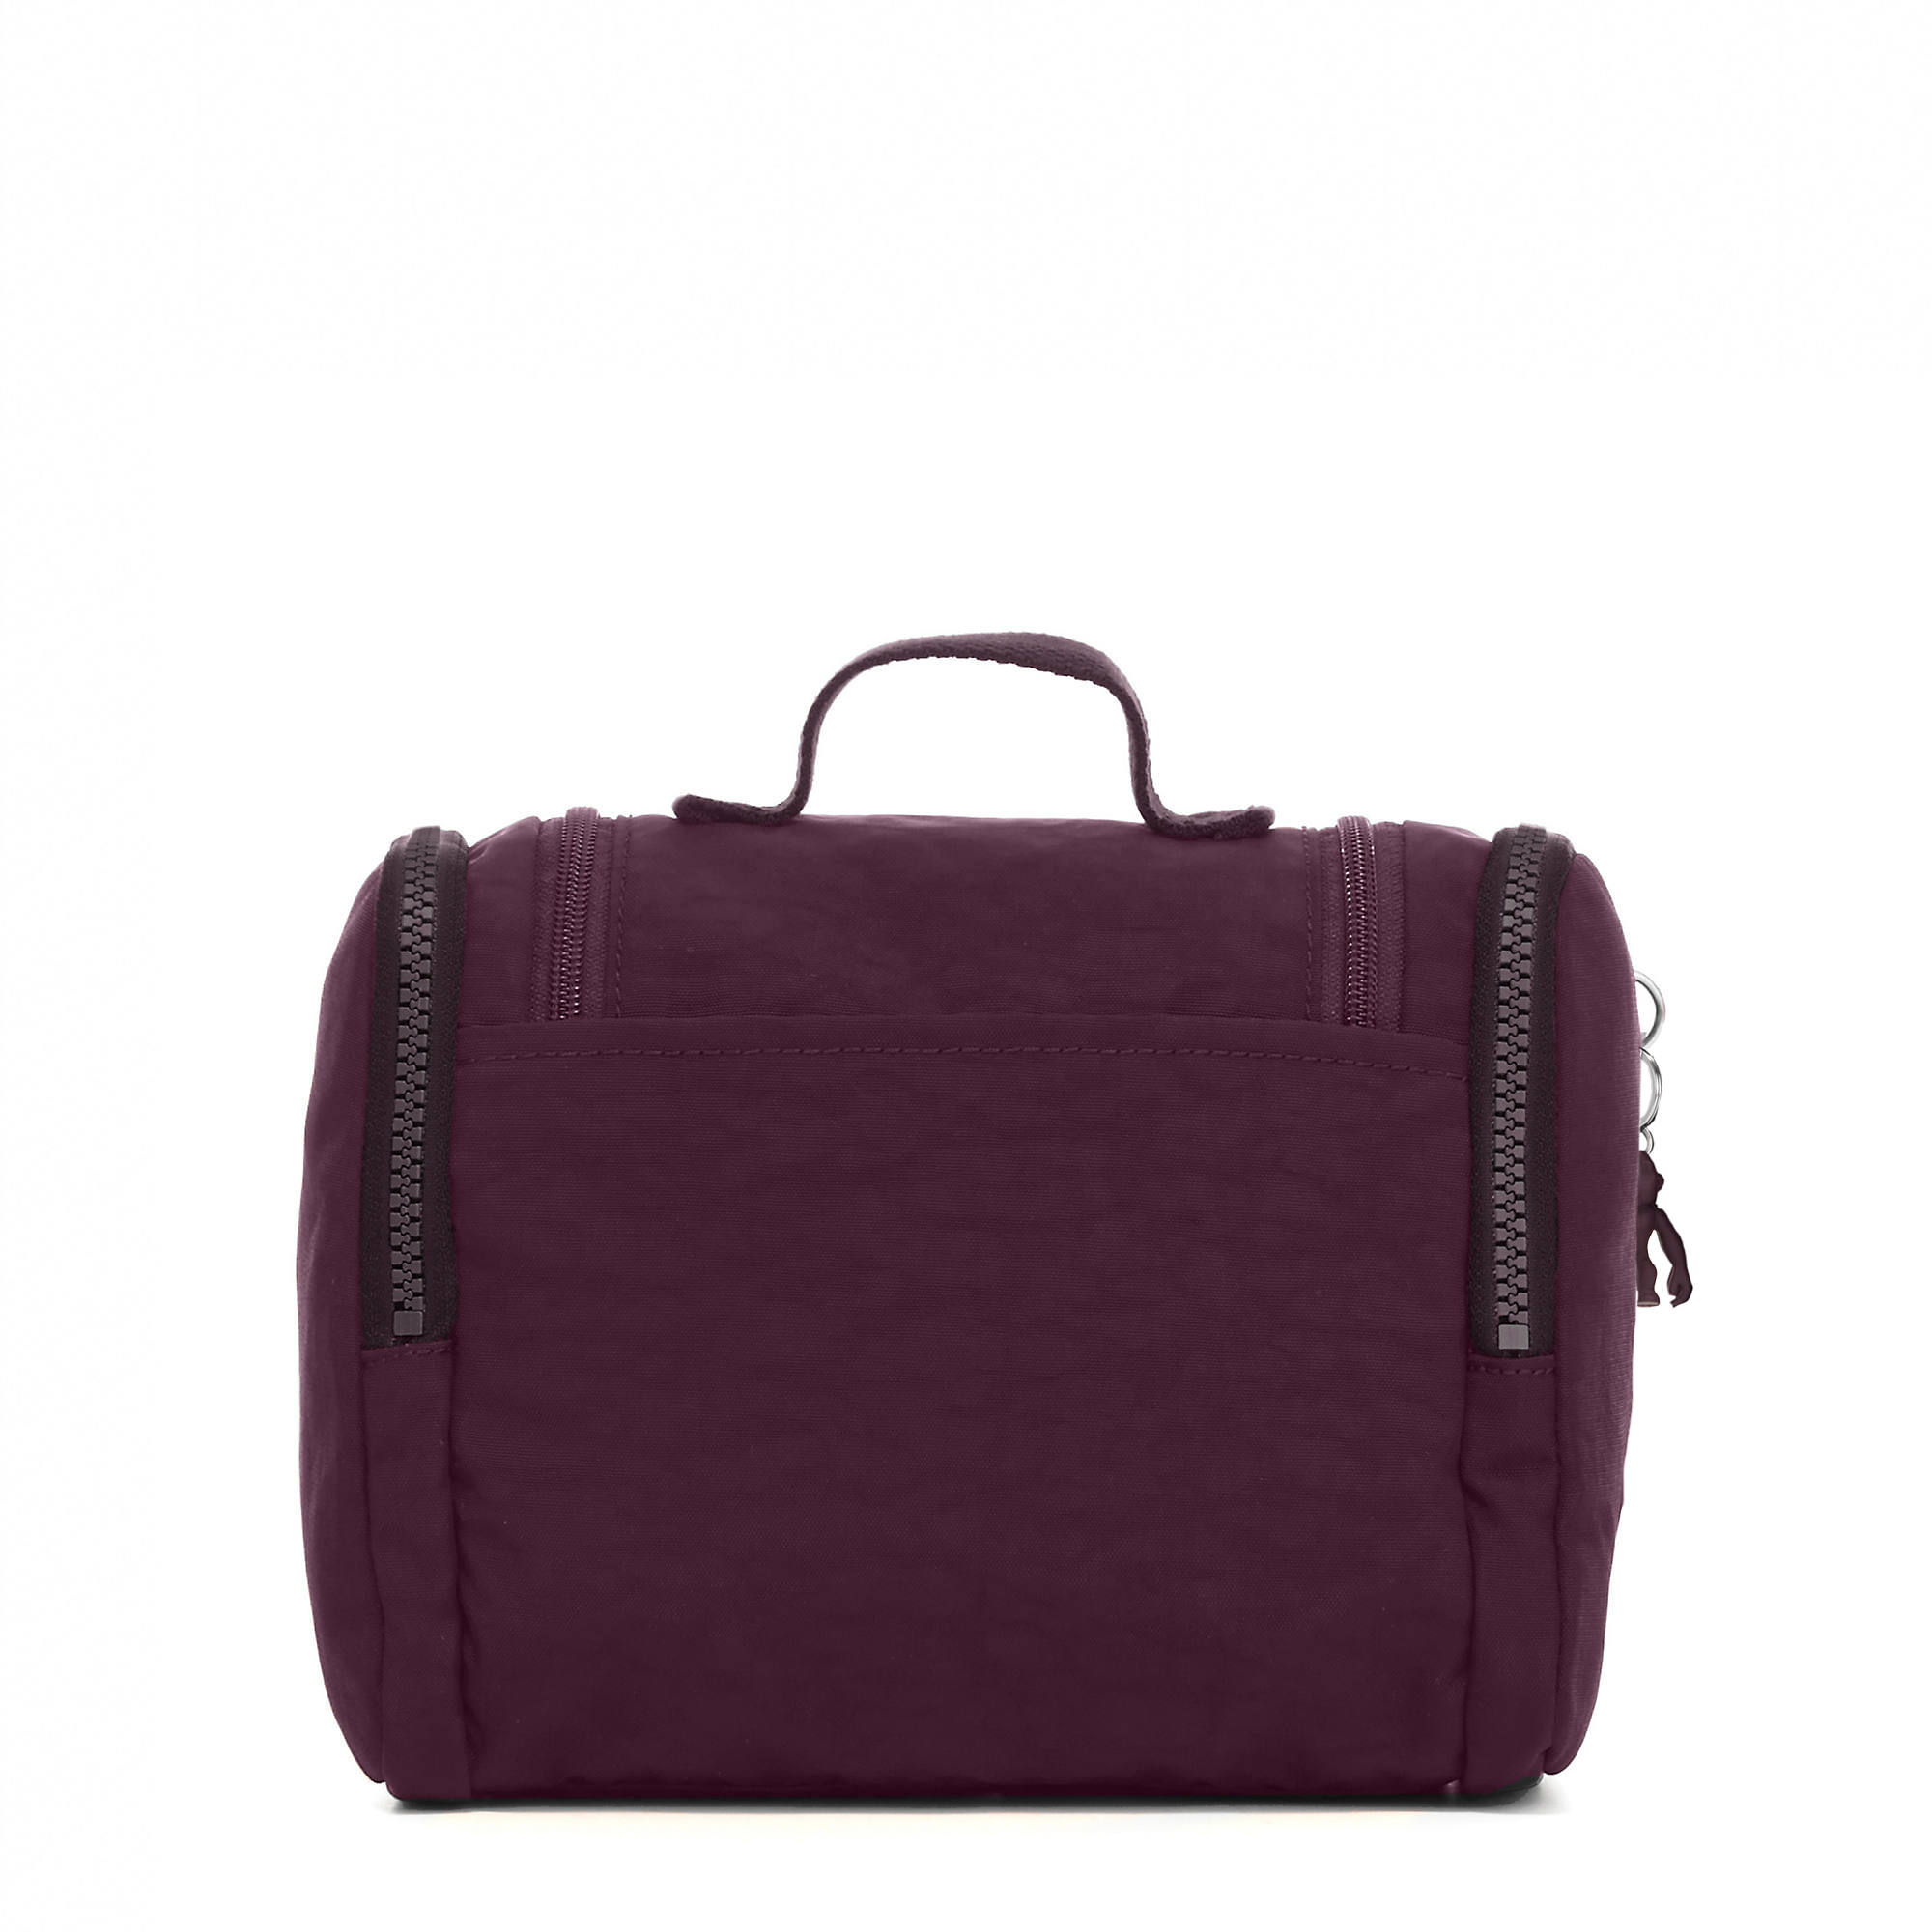 ADGAI Zebra Canvas Travel Weekender Bag,Fashion Custom Lightweight Large Capacity Portable Luggage Bag,Suitcase Trolley Bag